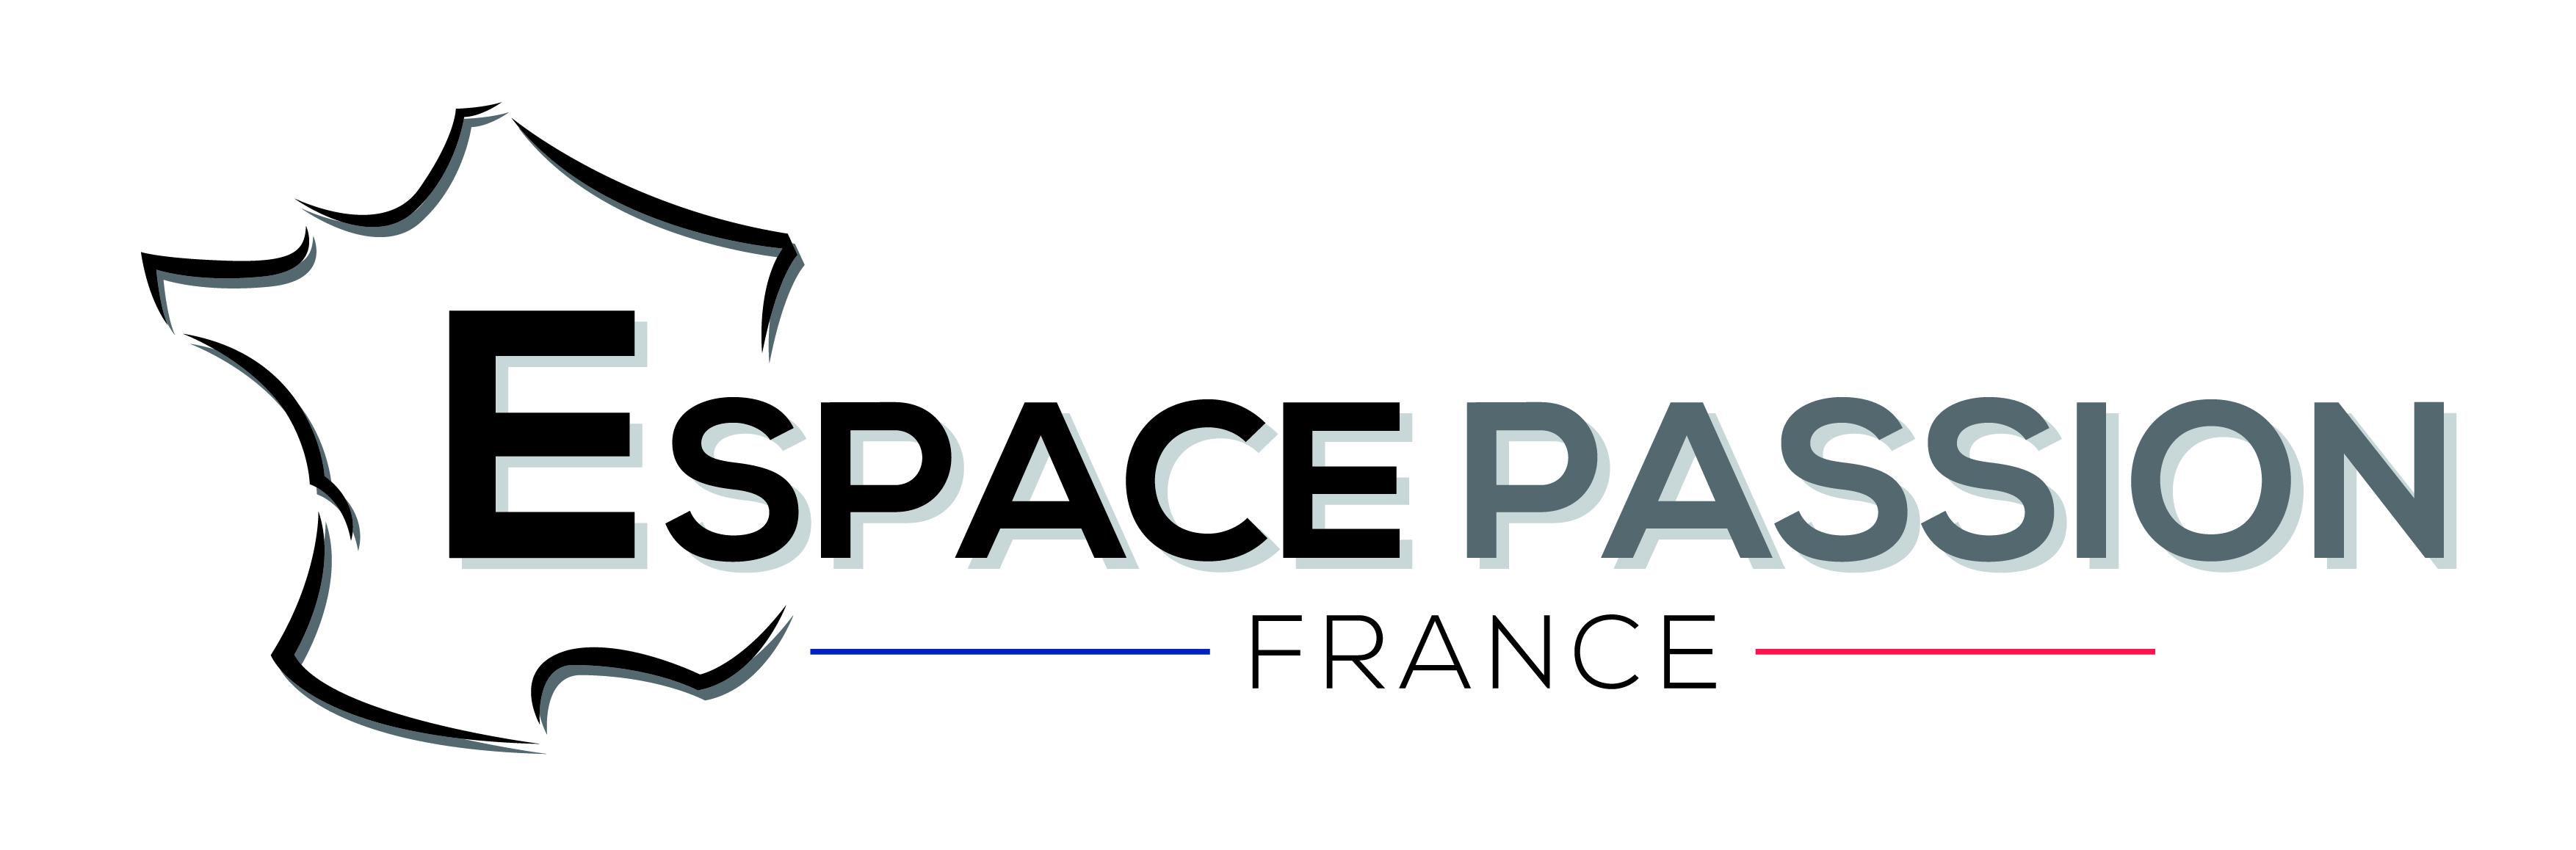 logo_espace_passion_france_ok.jpg